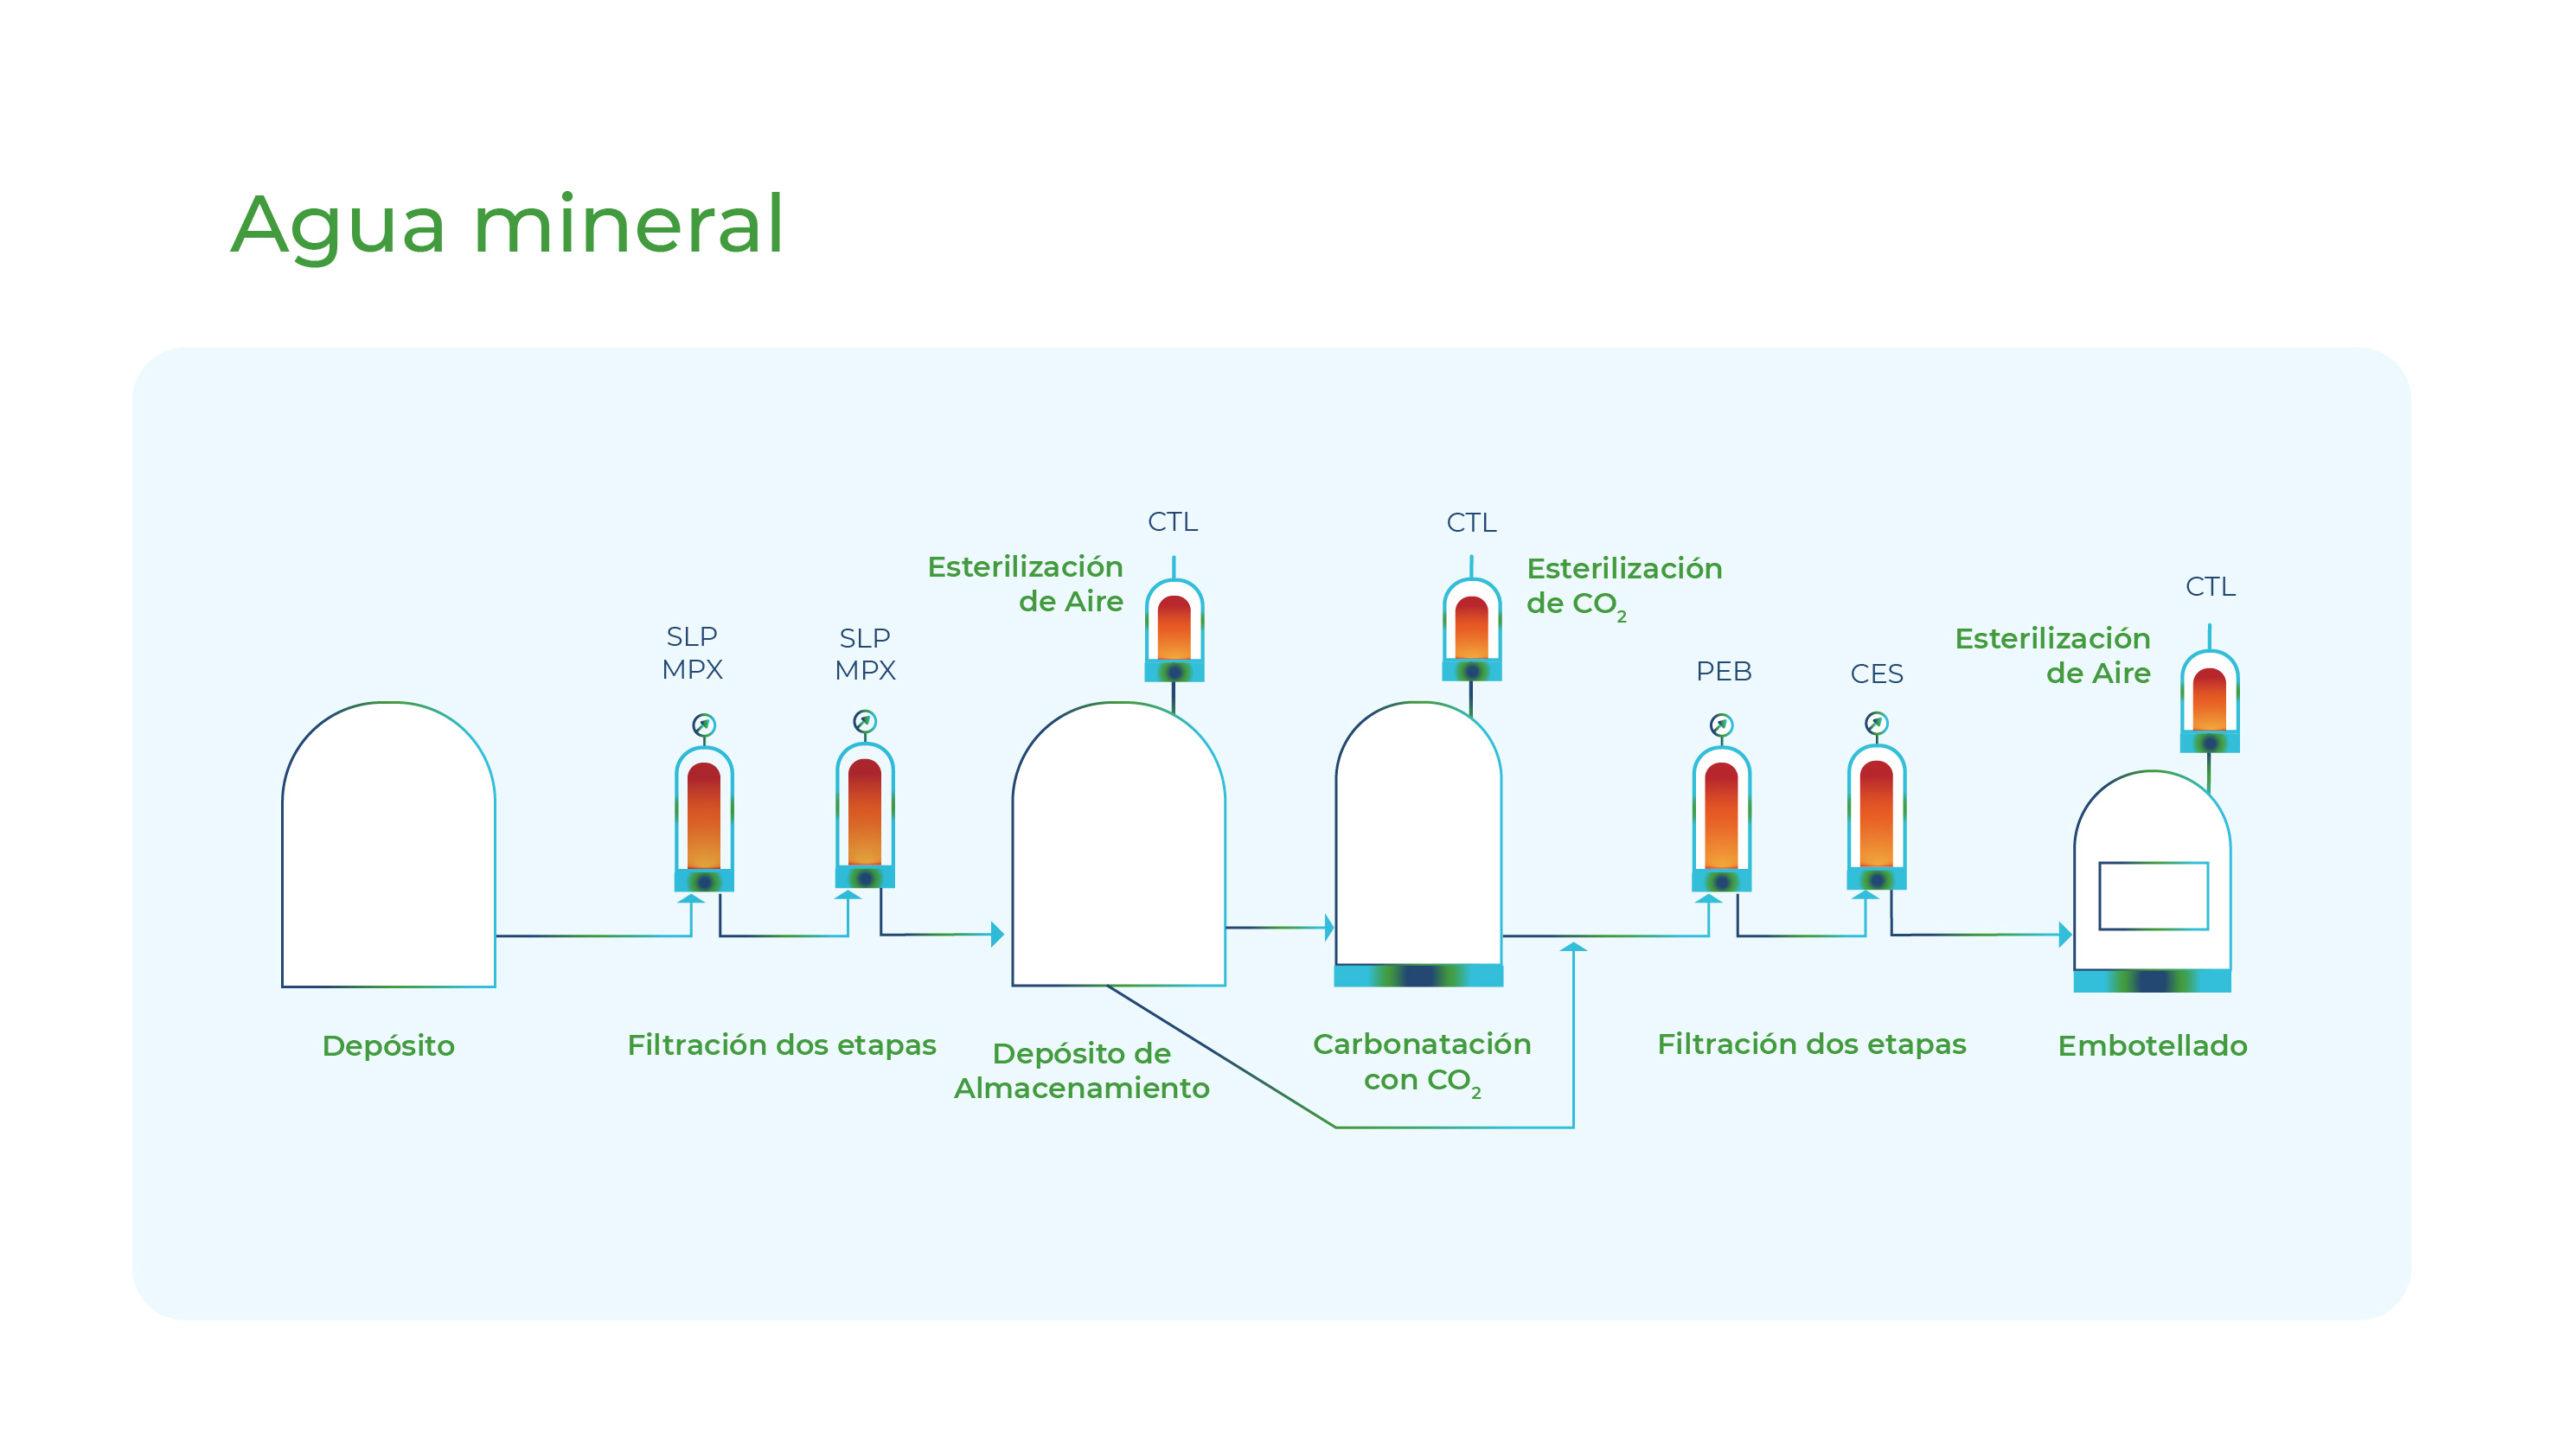 Diagrama Agua Mineral Gesfilter